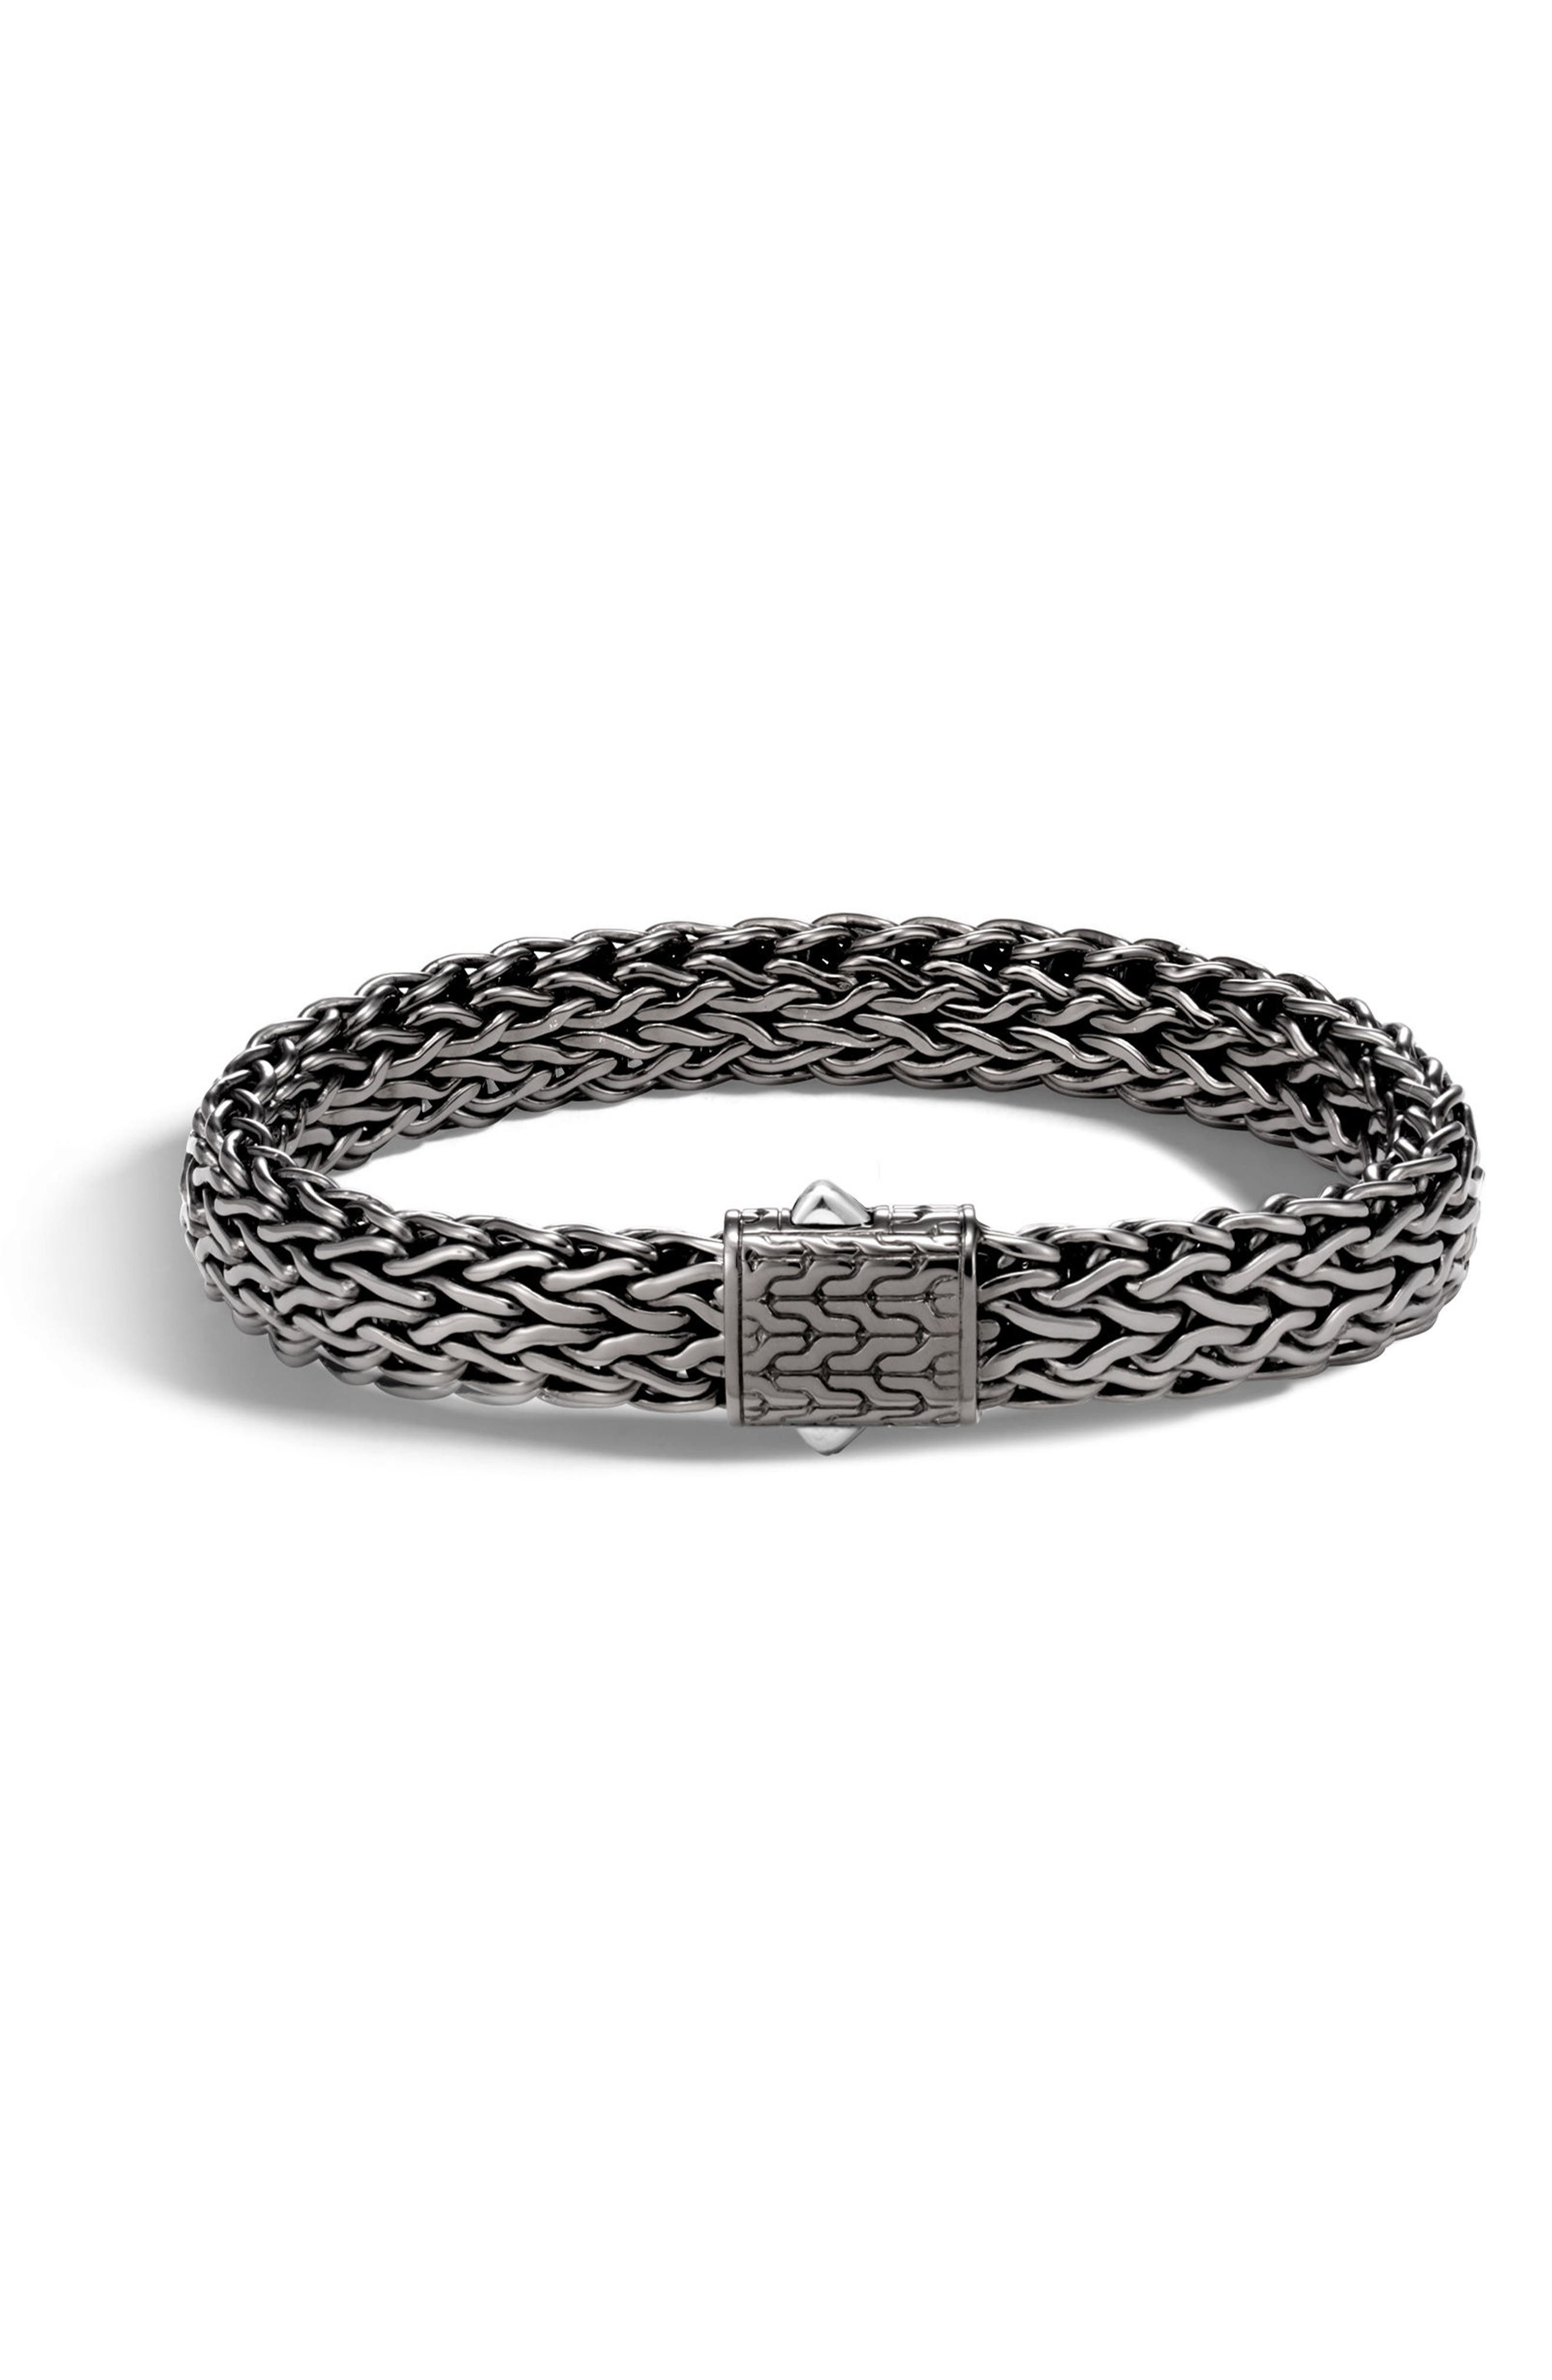 Large Flat Classic Chain Bracelet,                             Main thumbnail 1, color,                             040